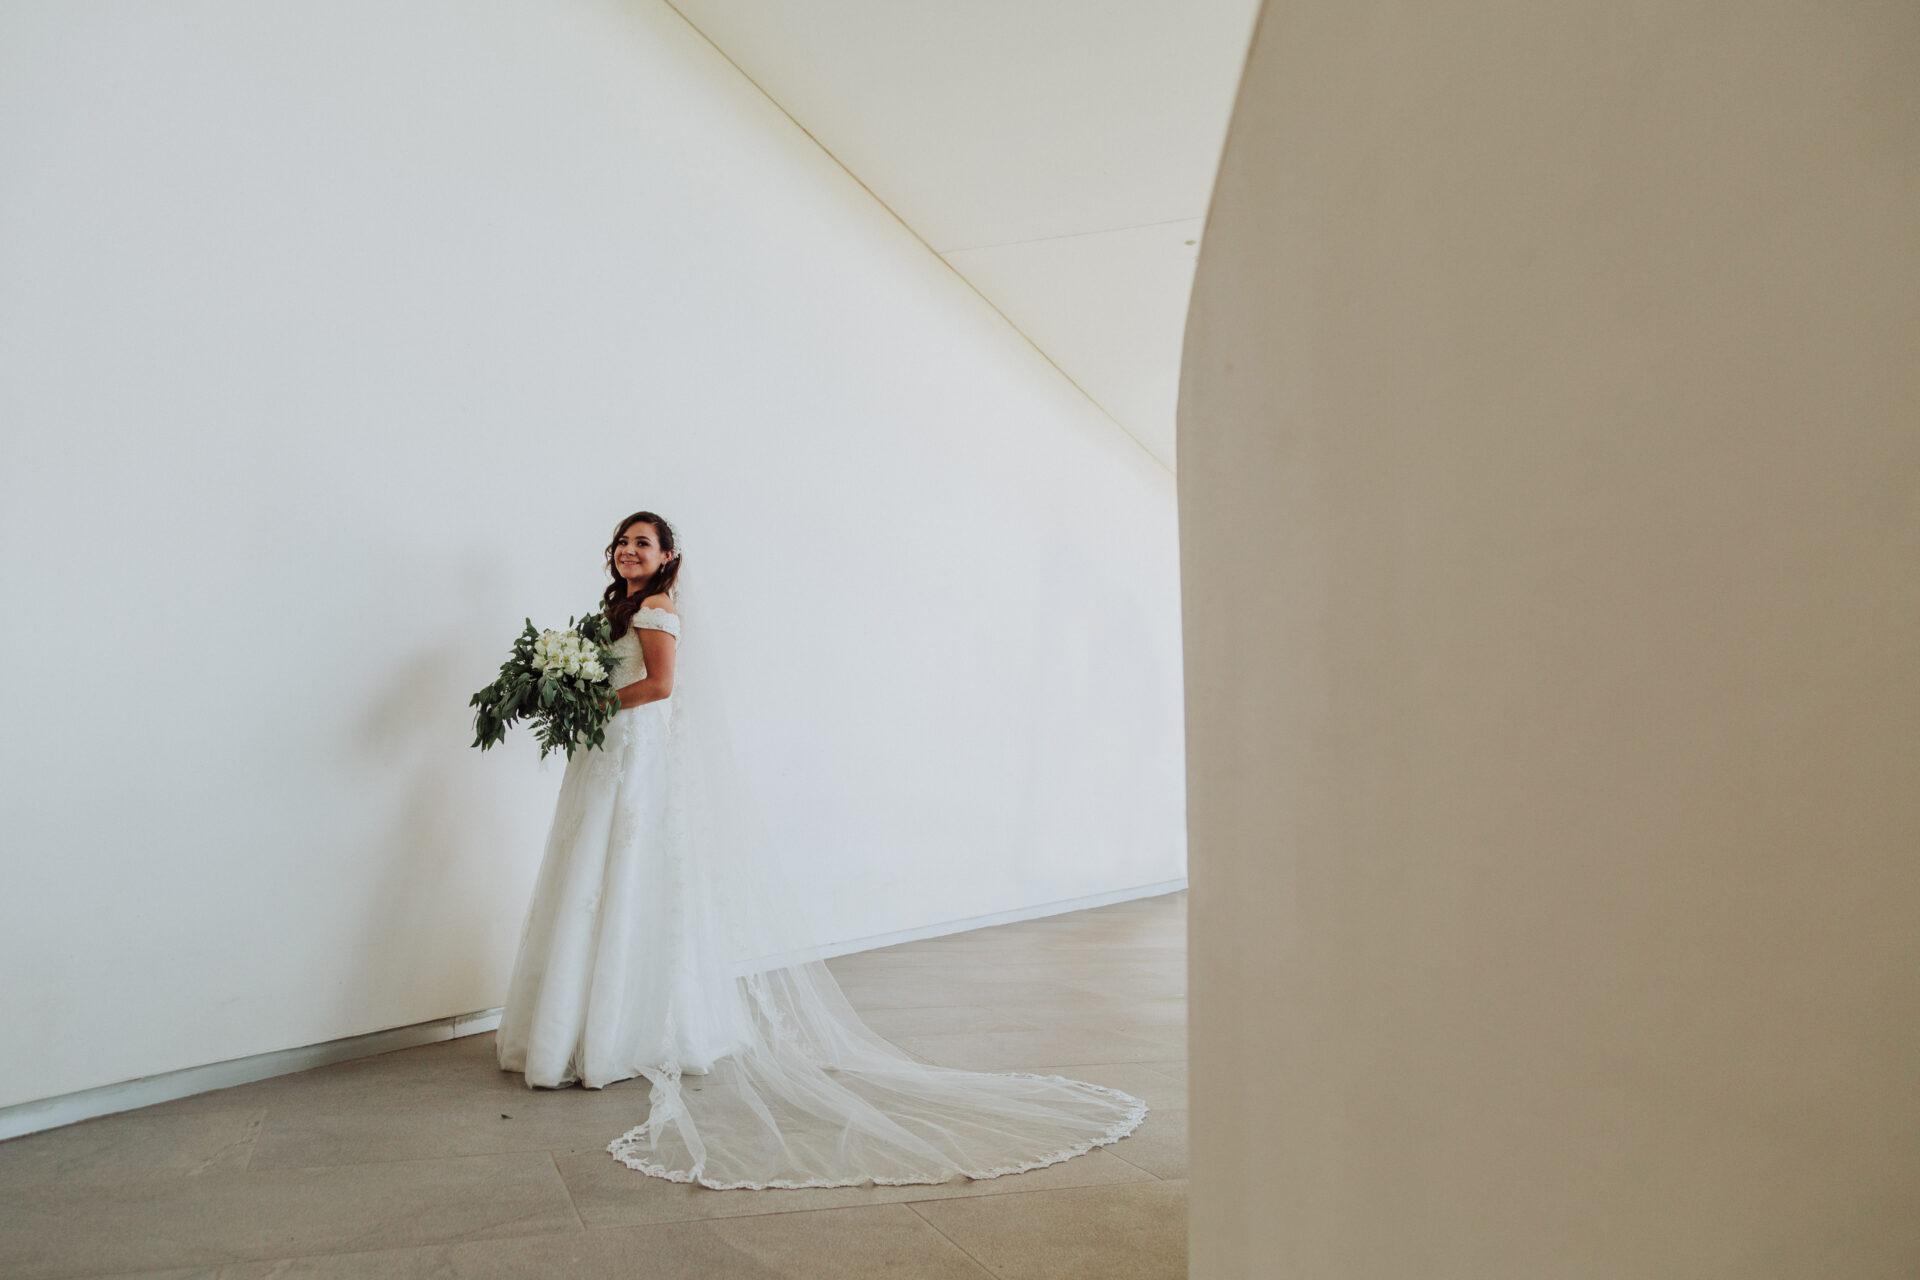 javier_noriega_fotografo_bodas_torreon_coahuila_zacatecas_wedding_photographer20a